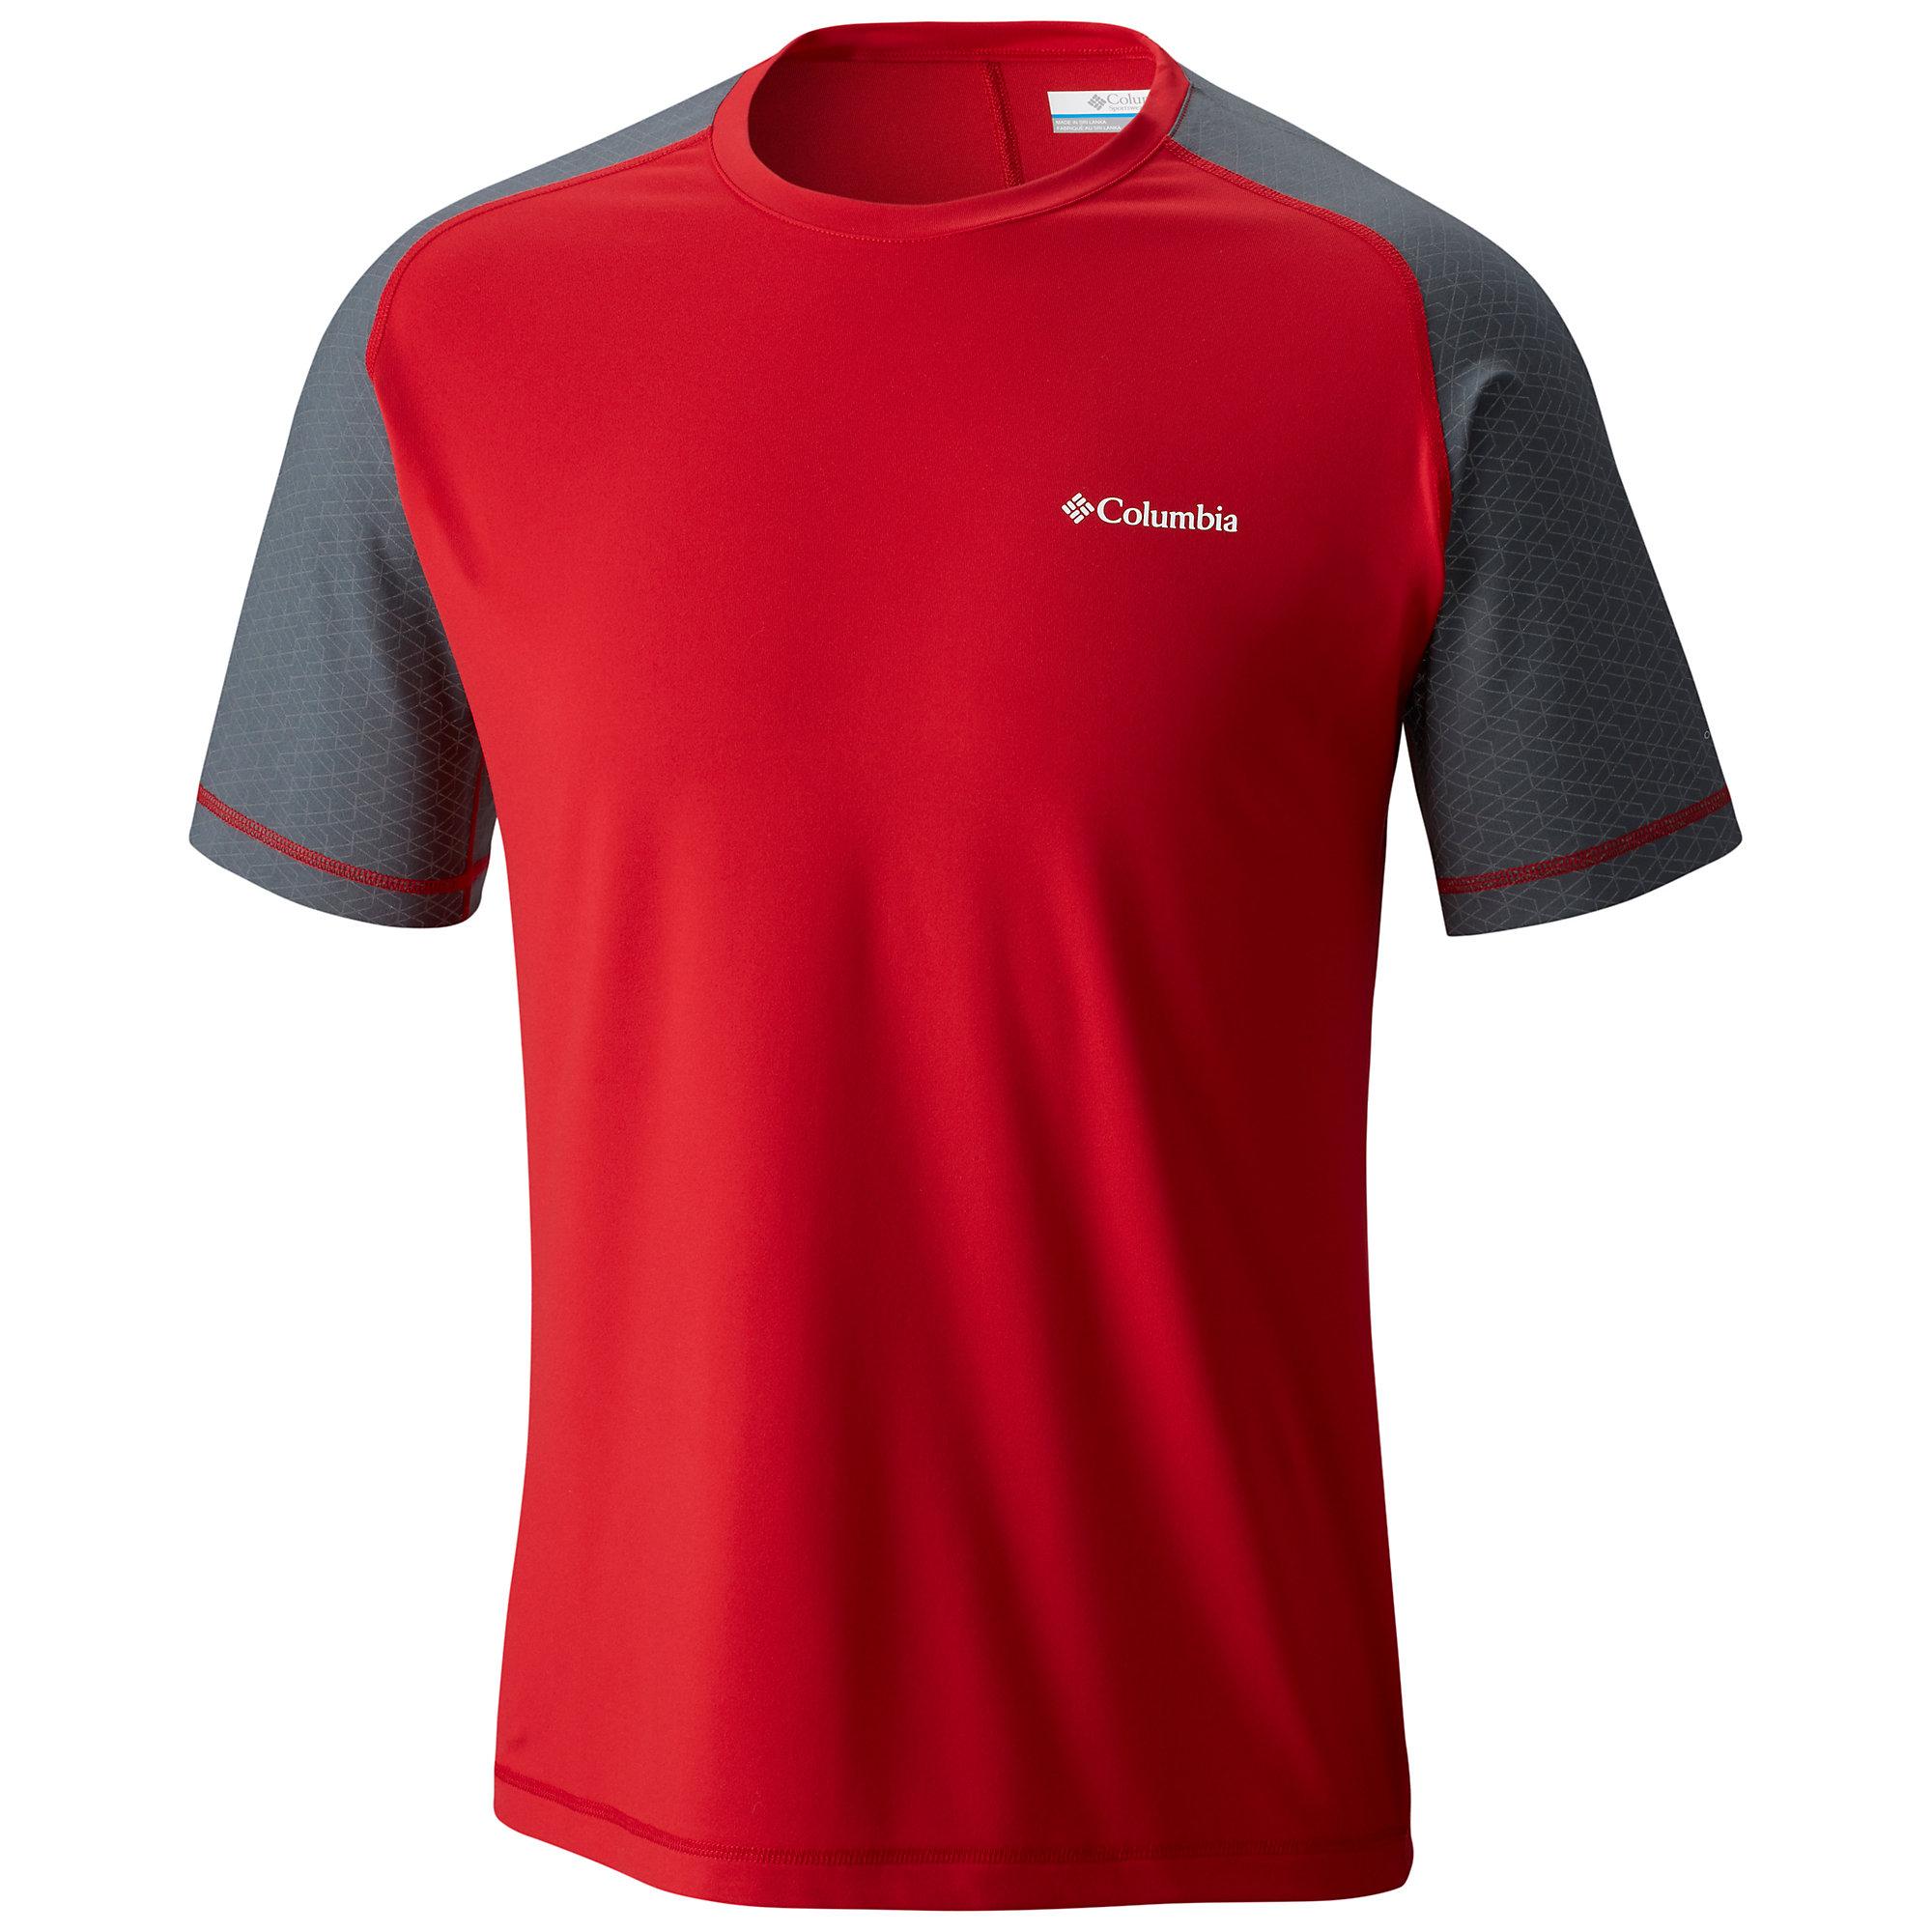 Columbia Trail Flash Short Sleeve Shirt